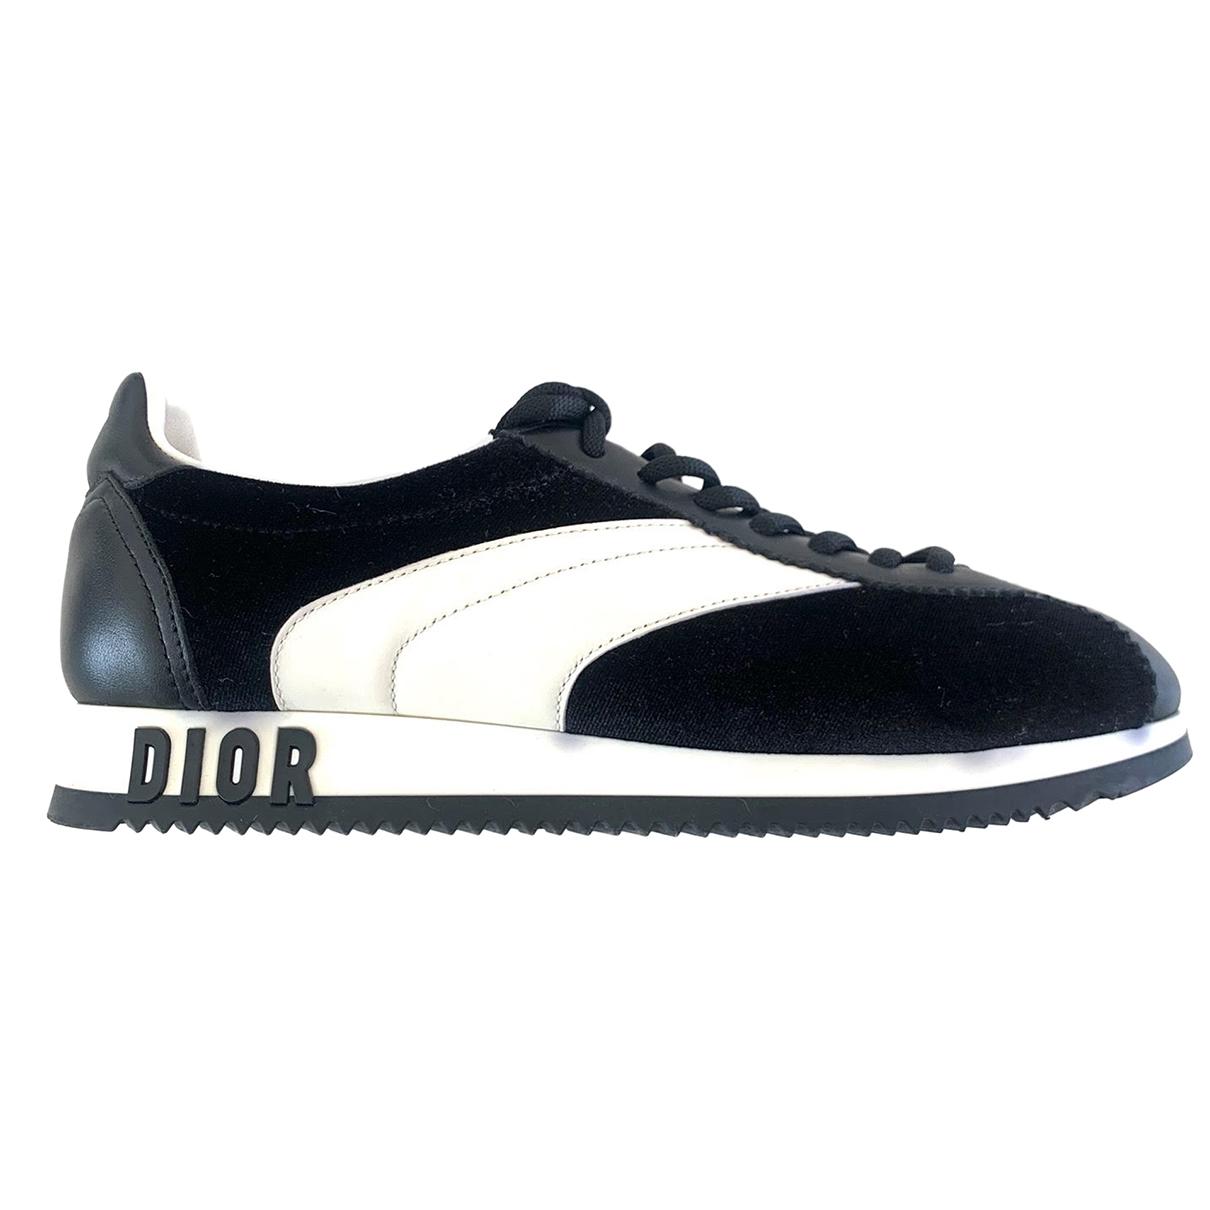 Dior Diorun Sneakers in  Schwarz Samt